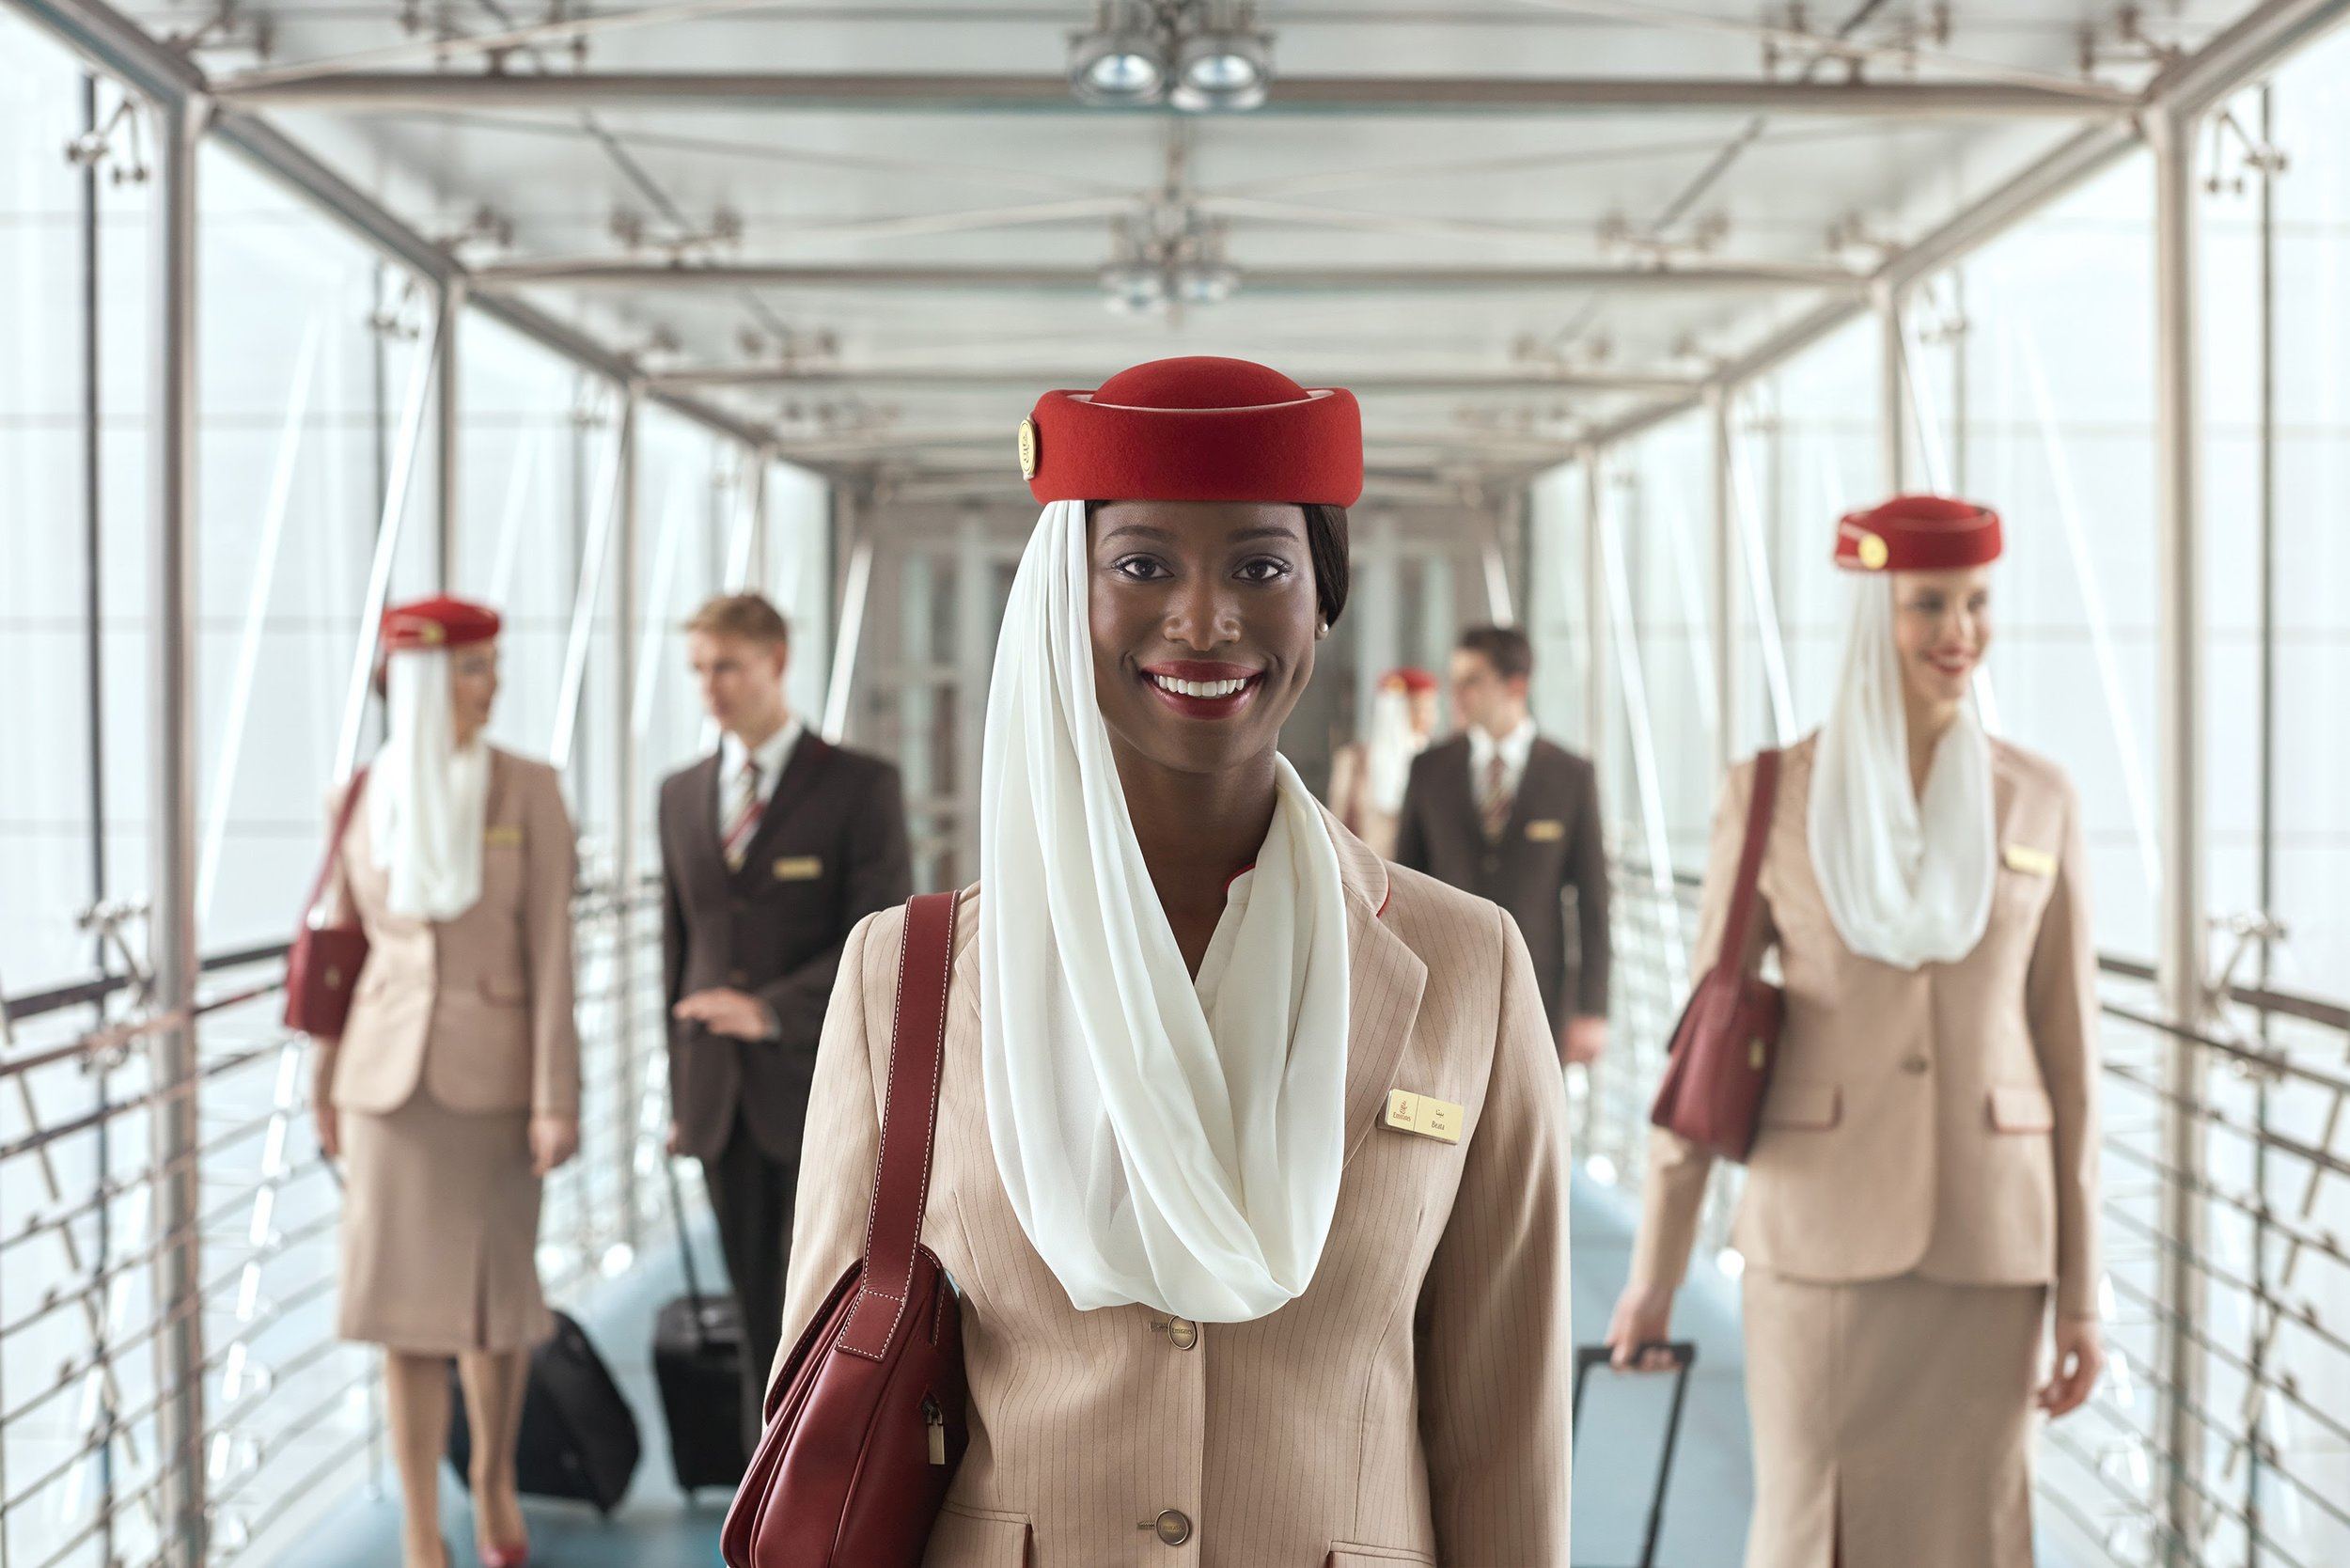 17-02-23_Emirates_4138_WORK.jpg